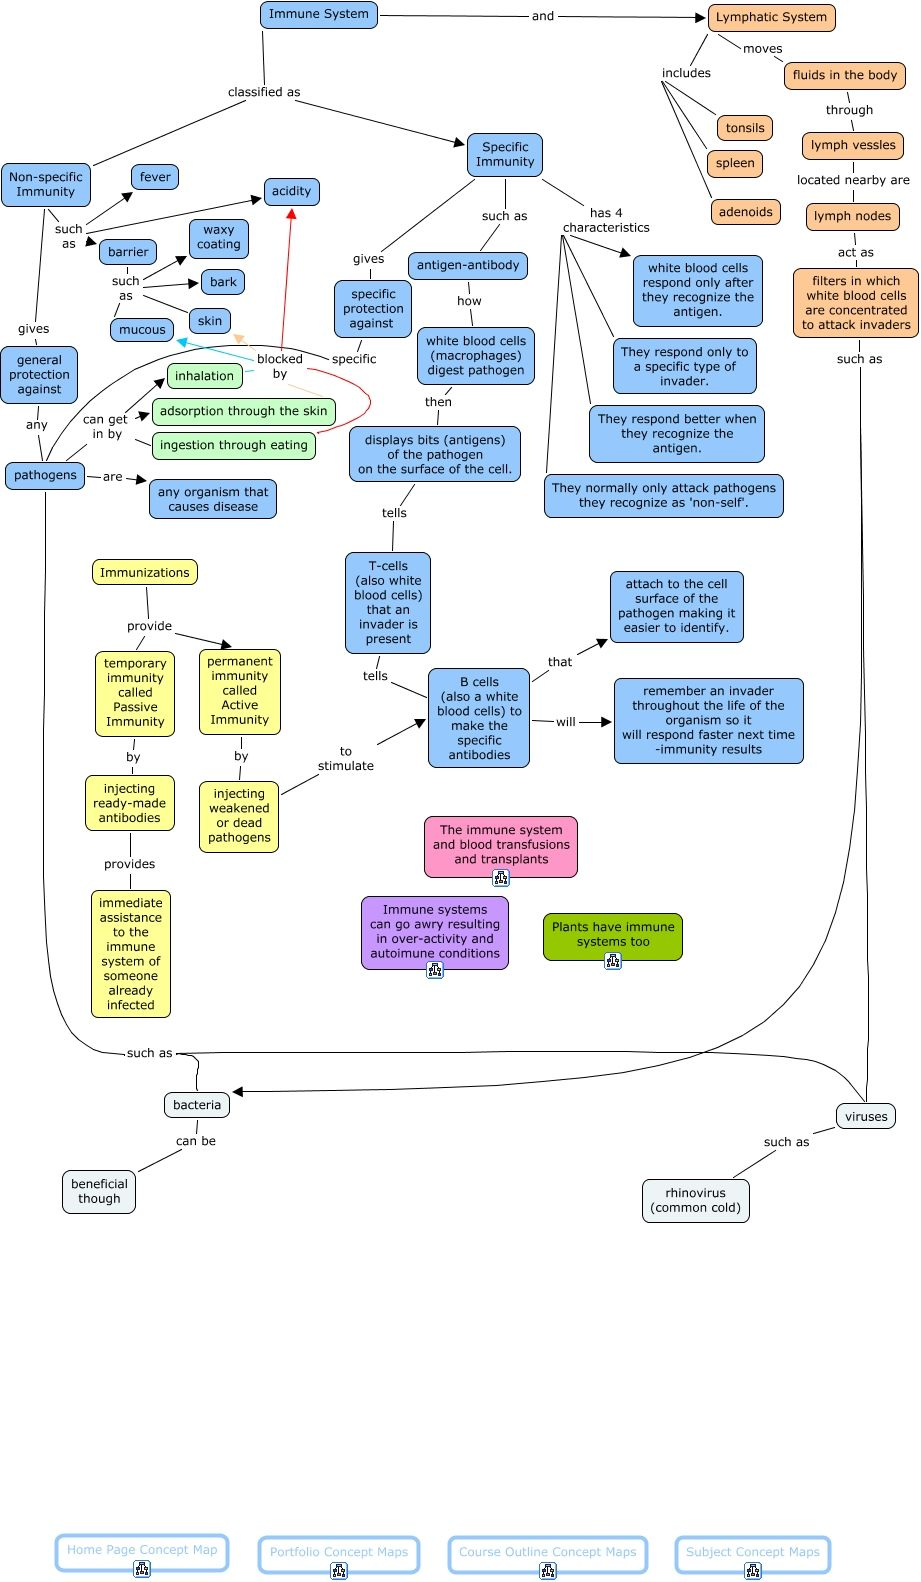 Anatomy of the immune system